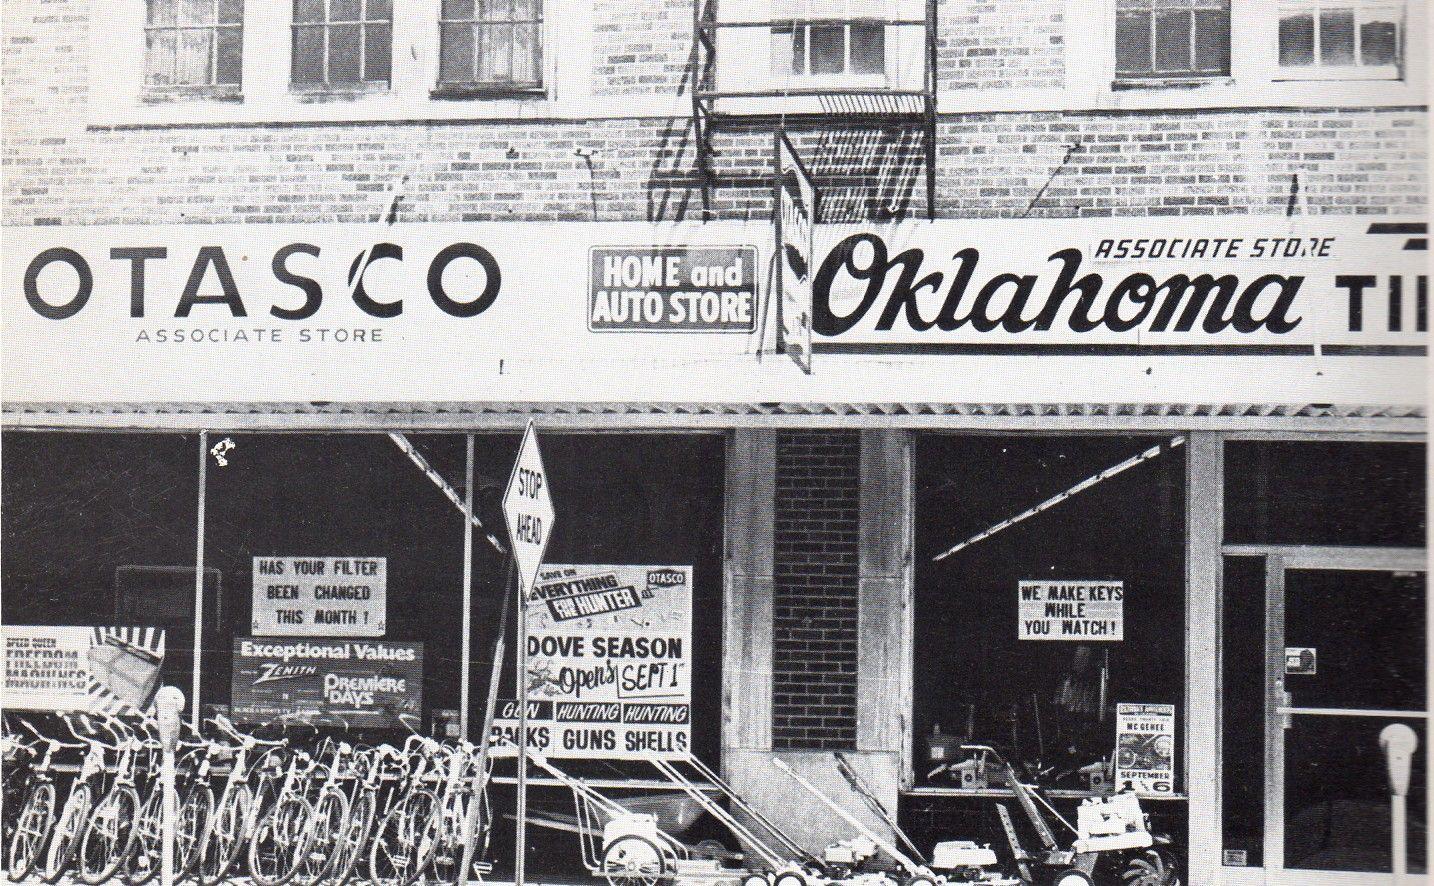 Otasco In Mcgehee Arkansas When It Was Still On First Street I